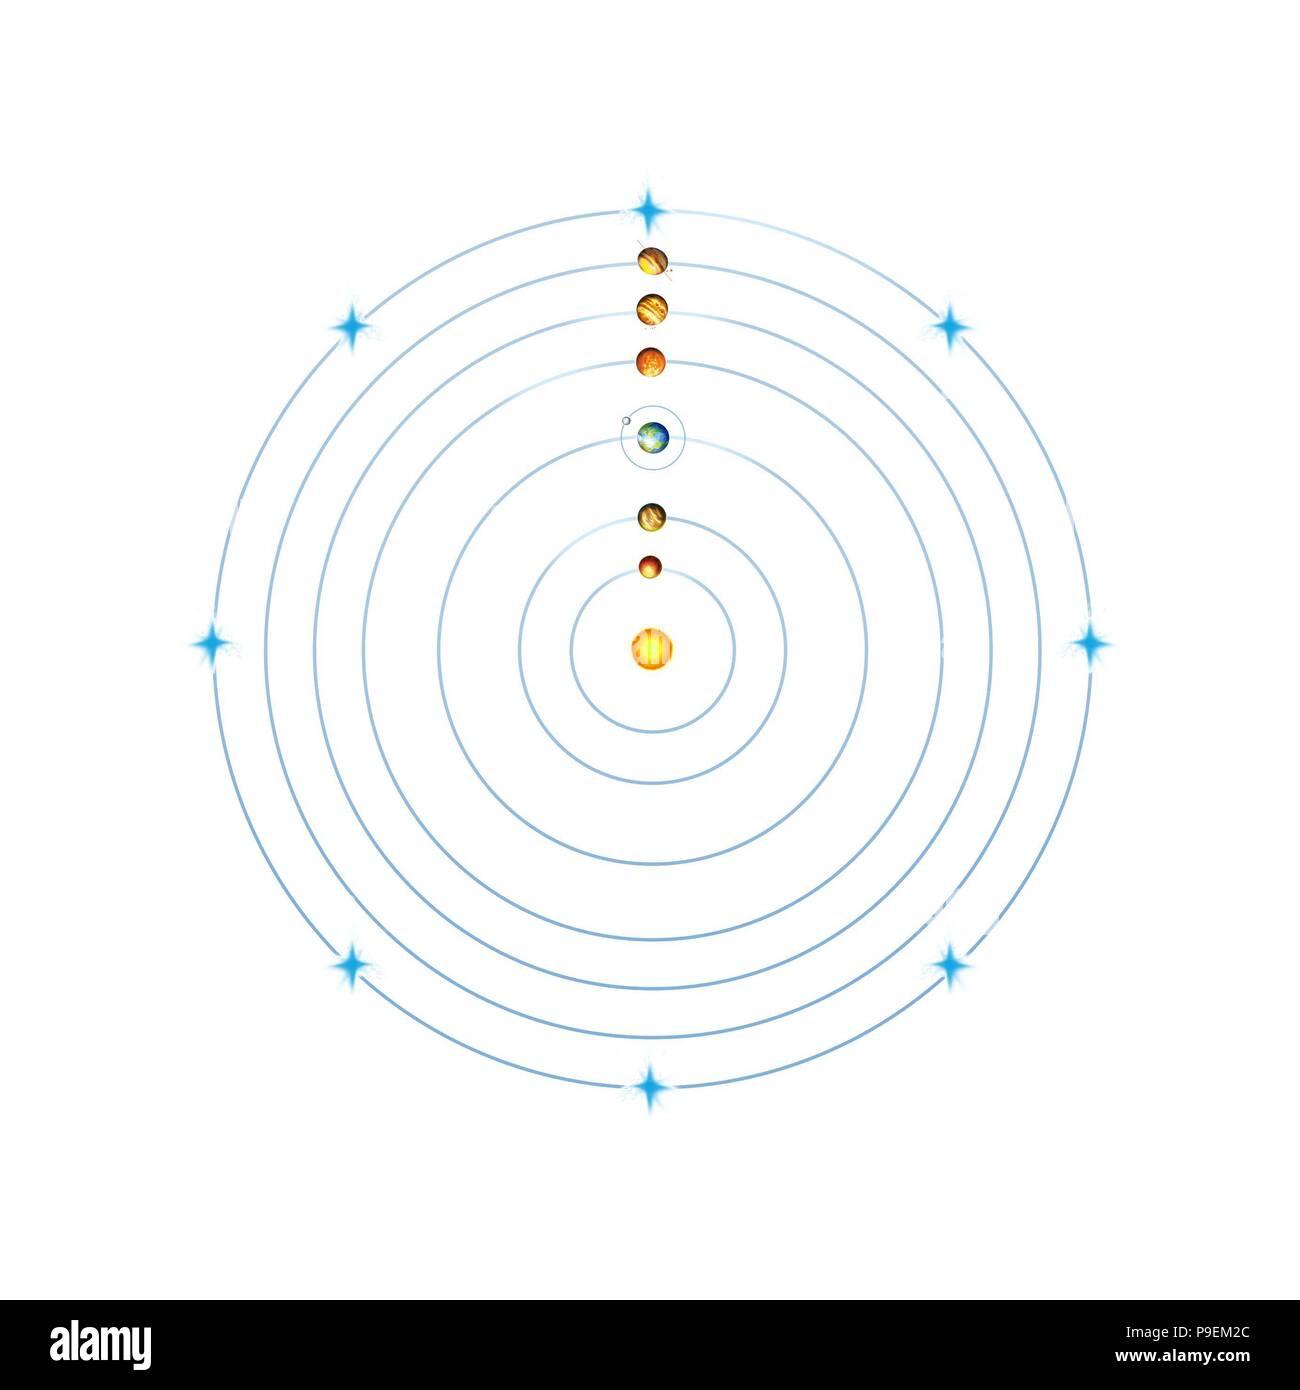 Copernican heliocentric system Stock Photo: 212379396 - Alamy